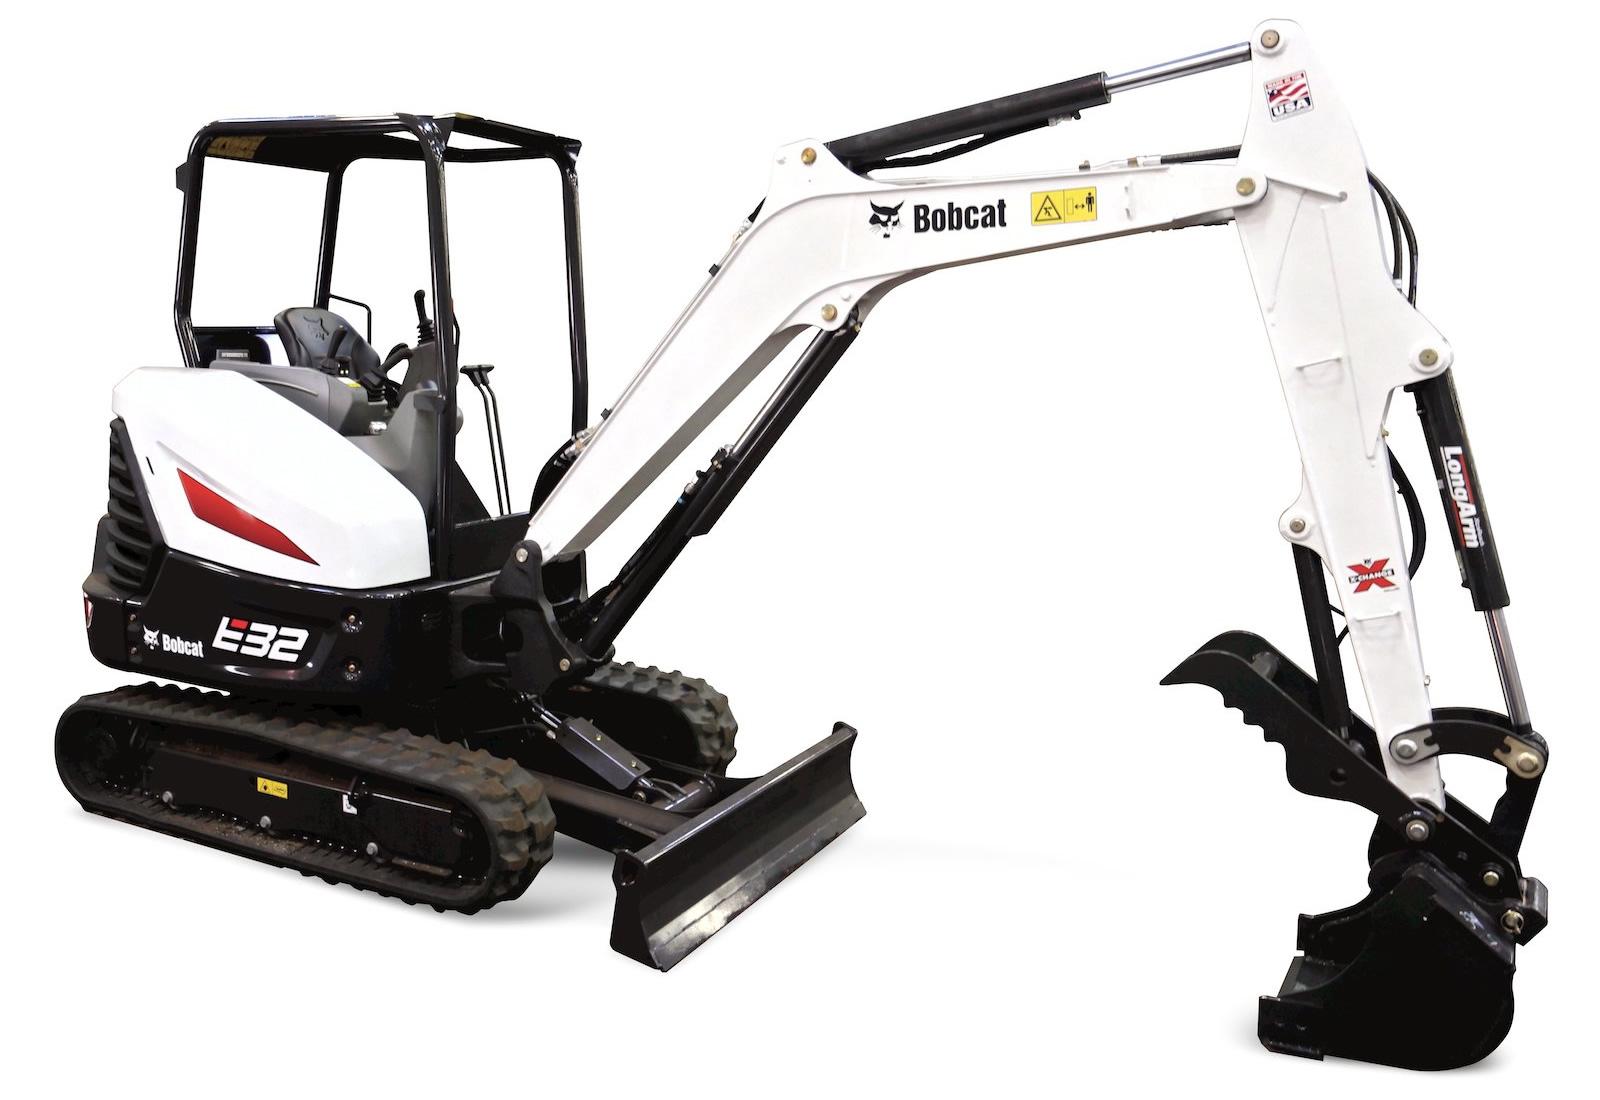 Mini Excavator Rental - 7000lbs Bobcat E32